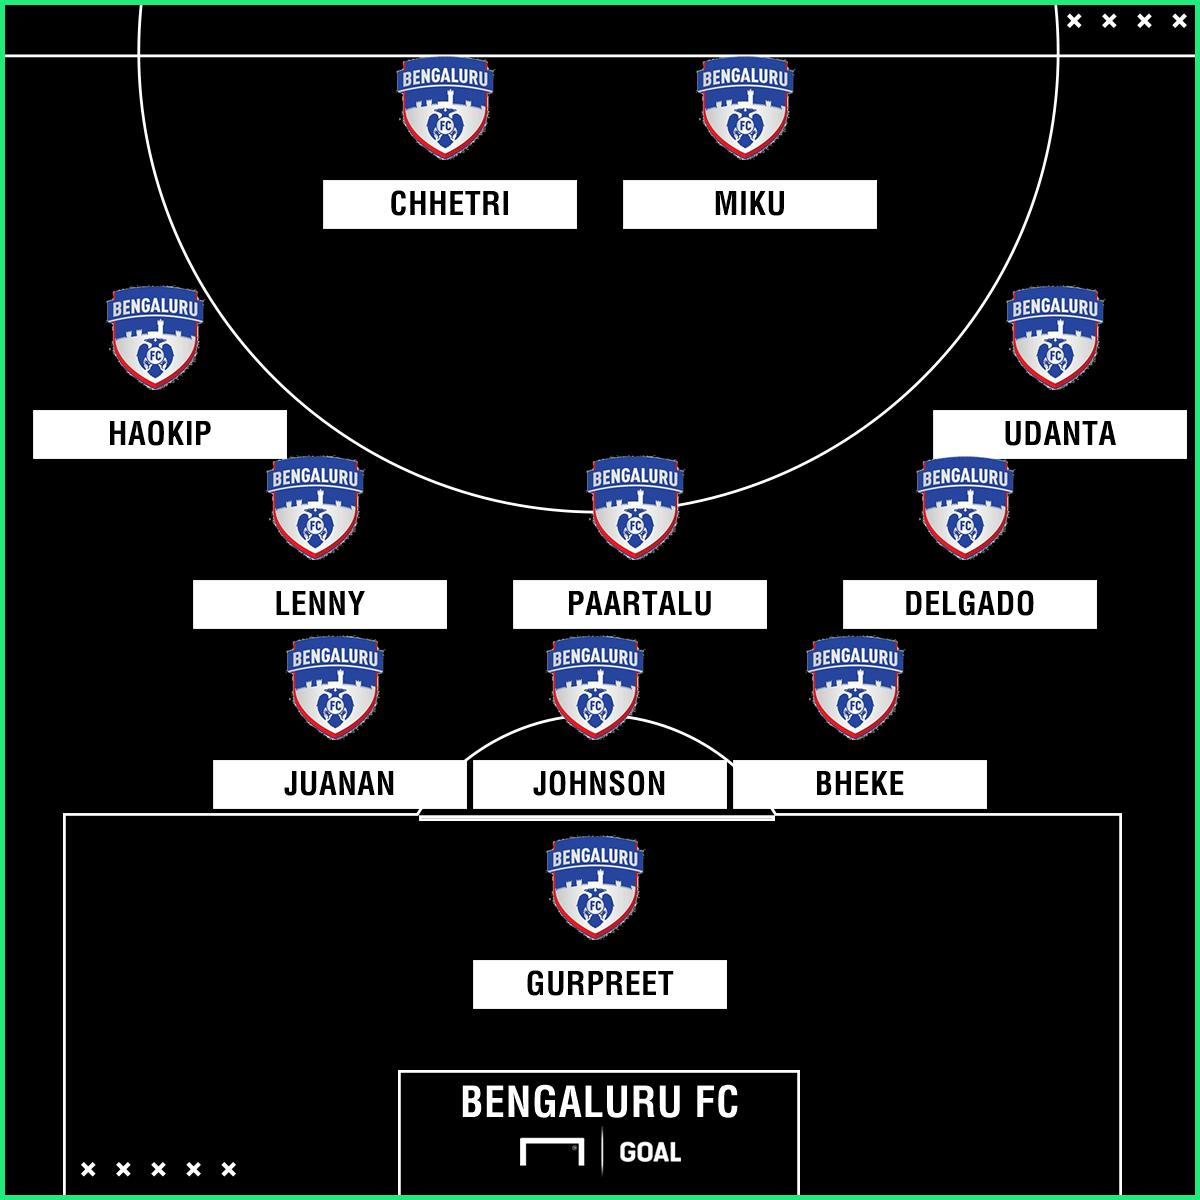 Bengaluru FC formation 3